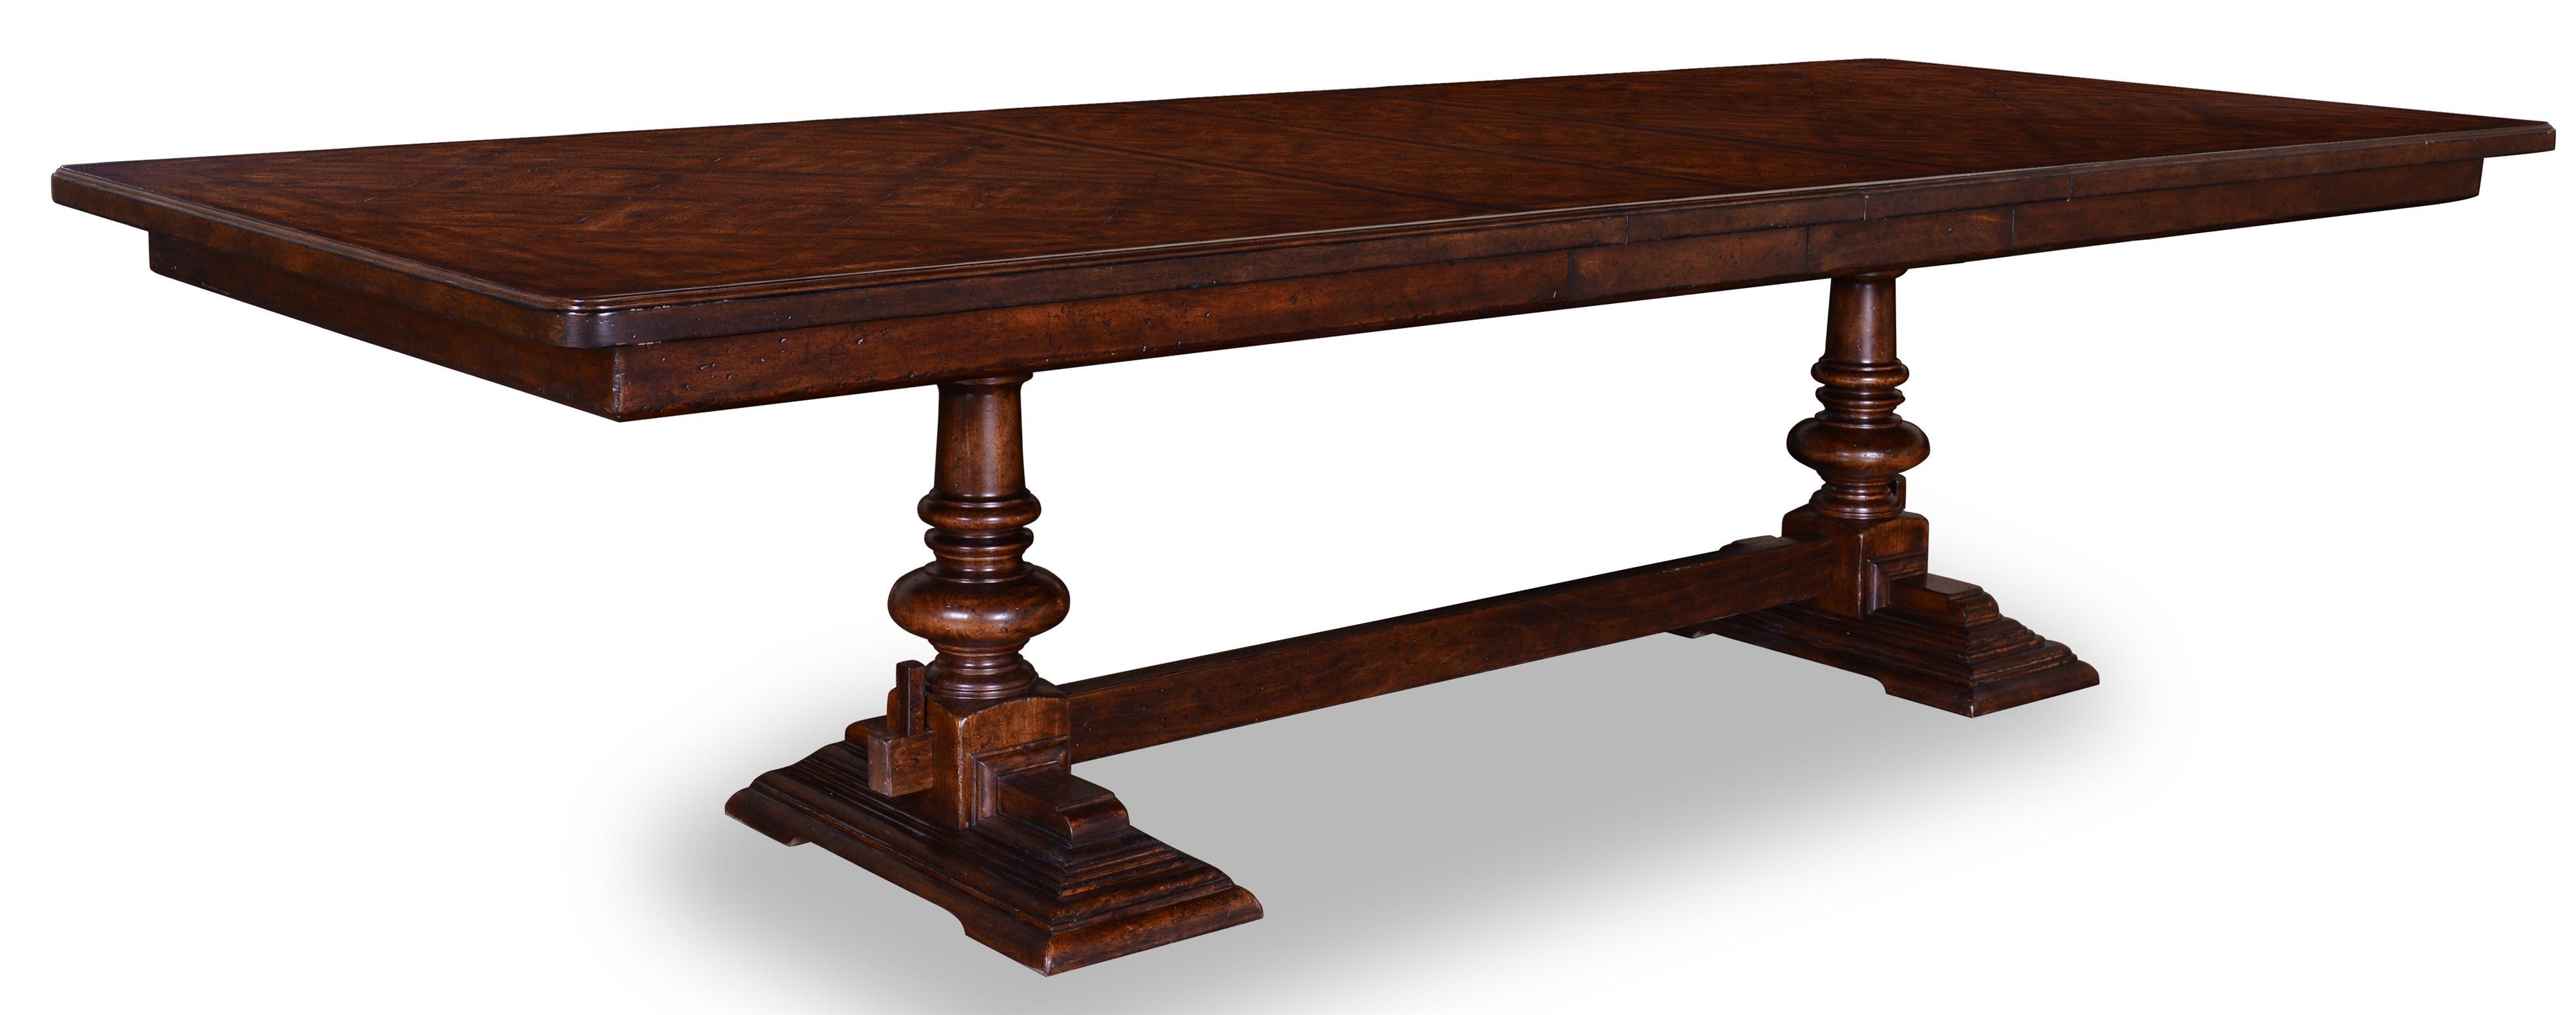 Belfort Signature Belvedere Trestle Dining Table - Item Number: 205221-2304